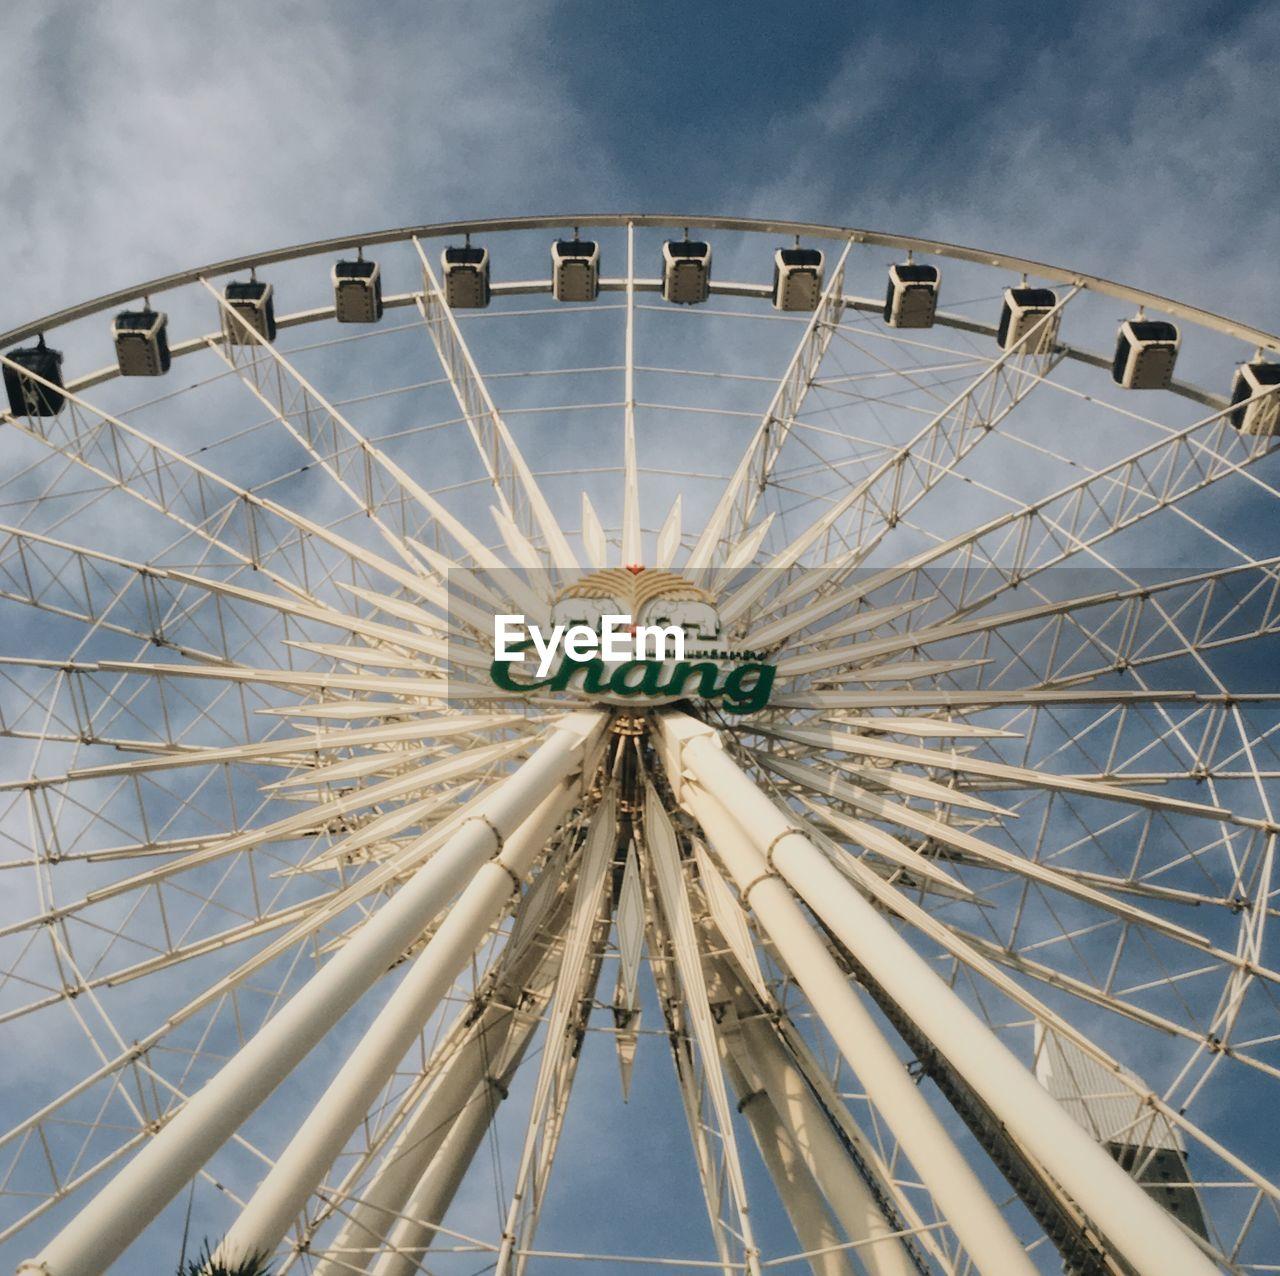 amusement park, arts culture and entertainment, amusement park ride, architecture, sky, ferris wheel, built structure, low angle view, metal, pattern, no people, day, circle, tourism, nature, geometric shape, shape, travel destinations, travel, outdoors, fairground, directly below